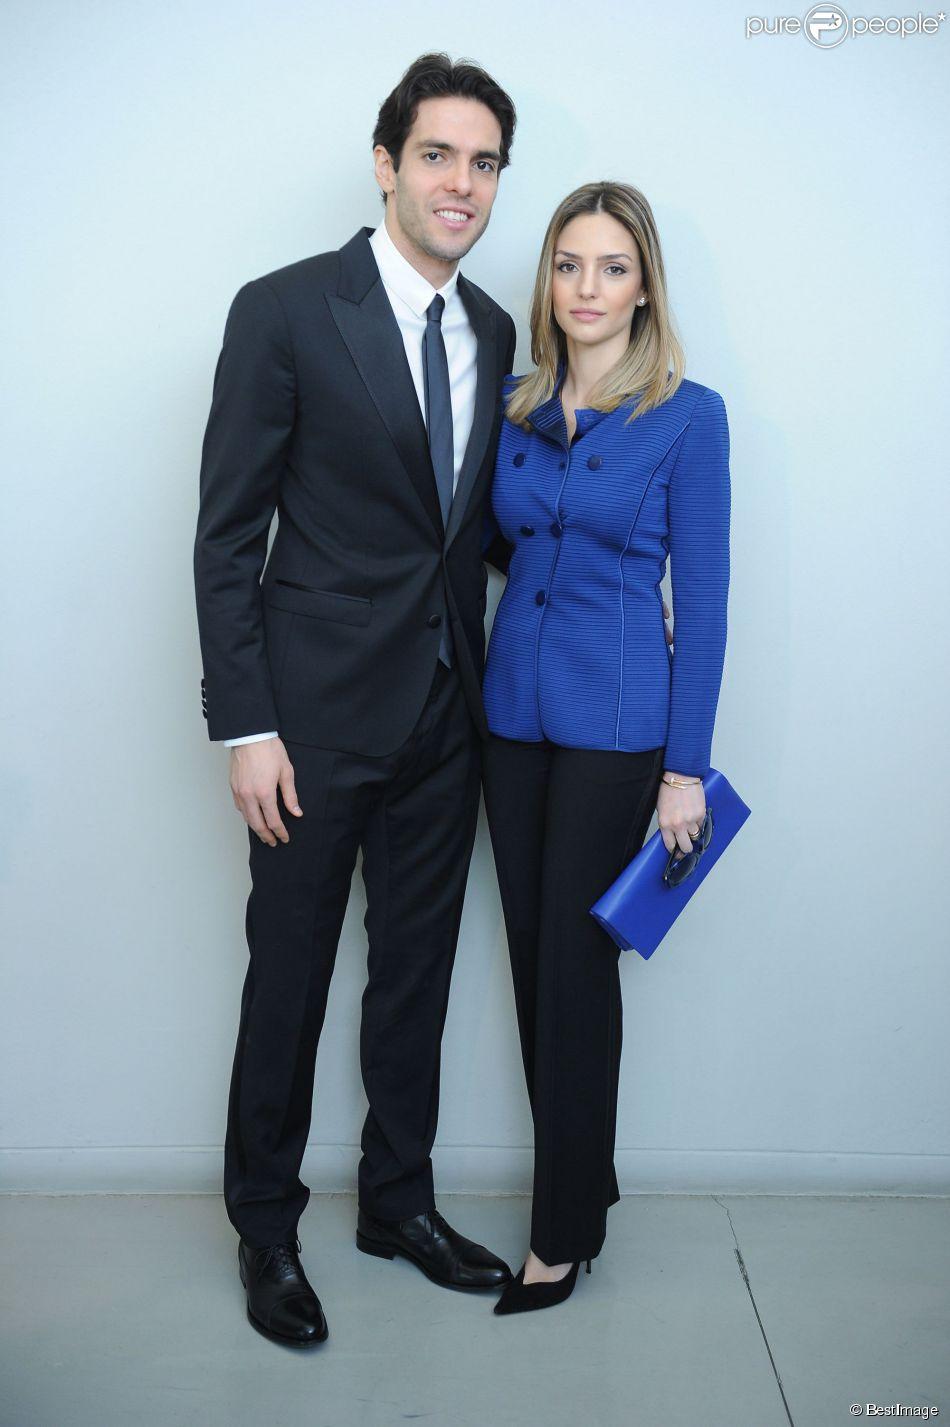 Ricardo Kaka et sa femme Caroline Celico à Milan le 24 février 2014.